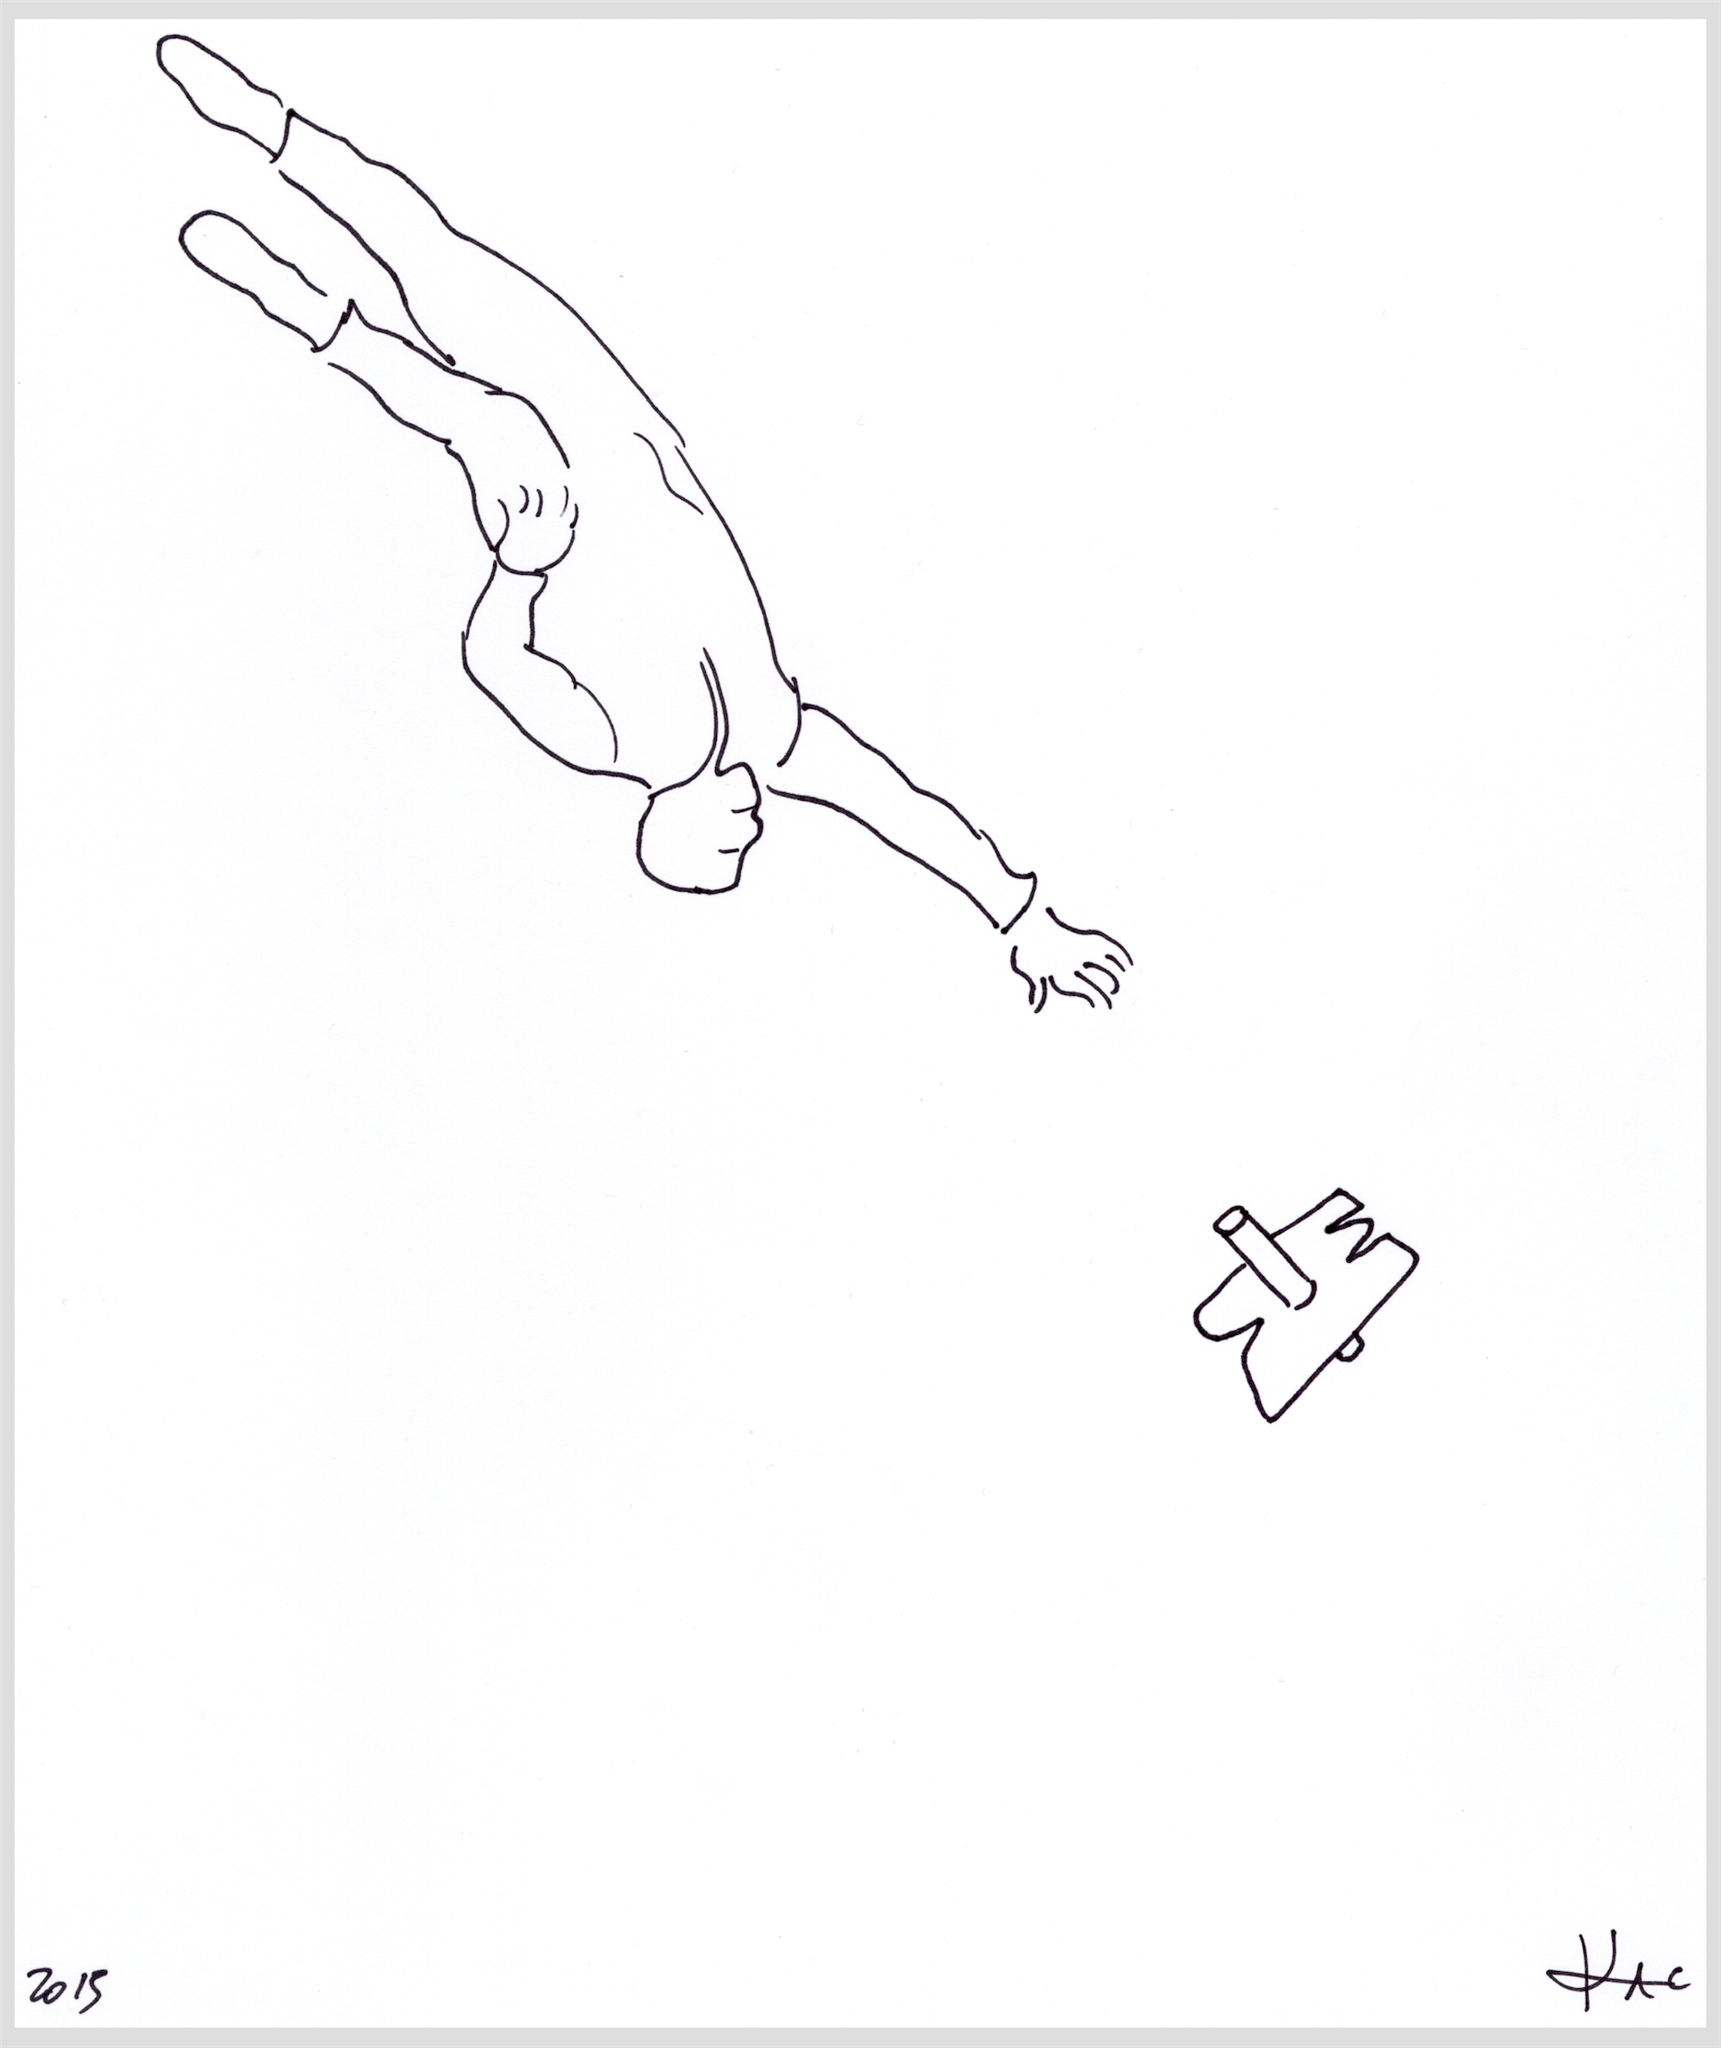 Eduardo Kac, Performance for one astronaut, Inner Telescope series, schwarze Tinte auf Hammermill Papier, 21,6 x 27,9 cm, 2015